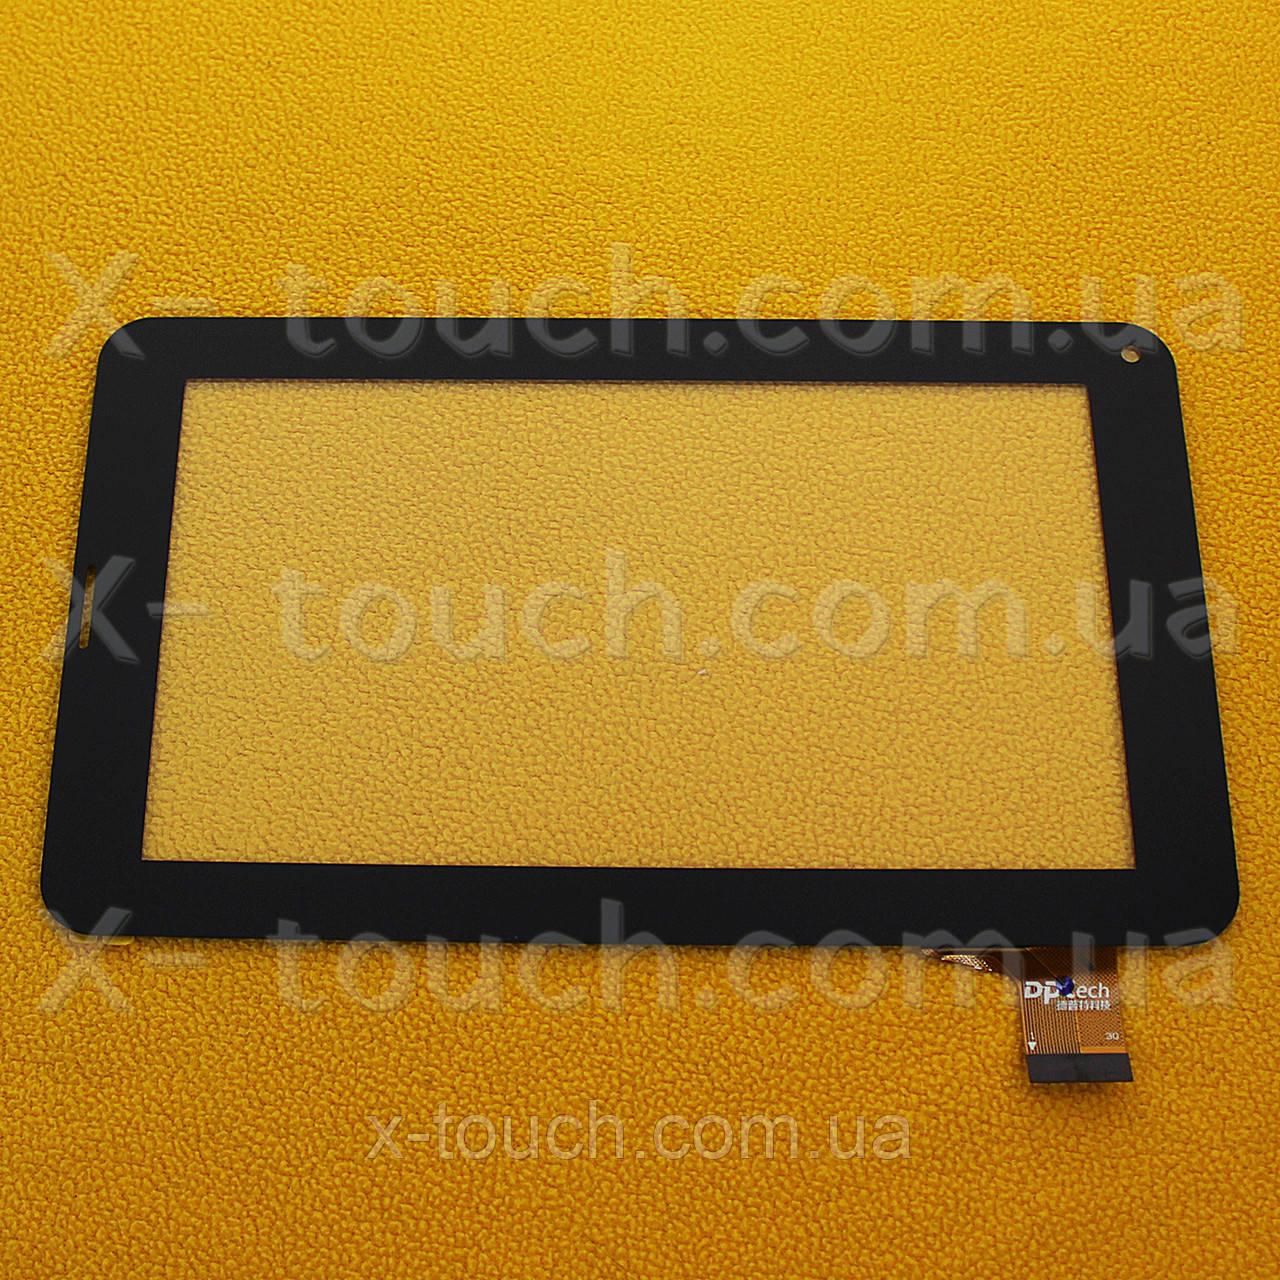 Тачскрин, сенсор  X-digital TAB702  для планшета